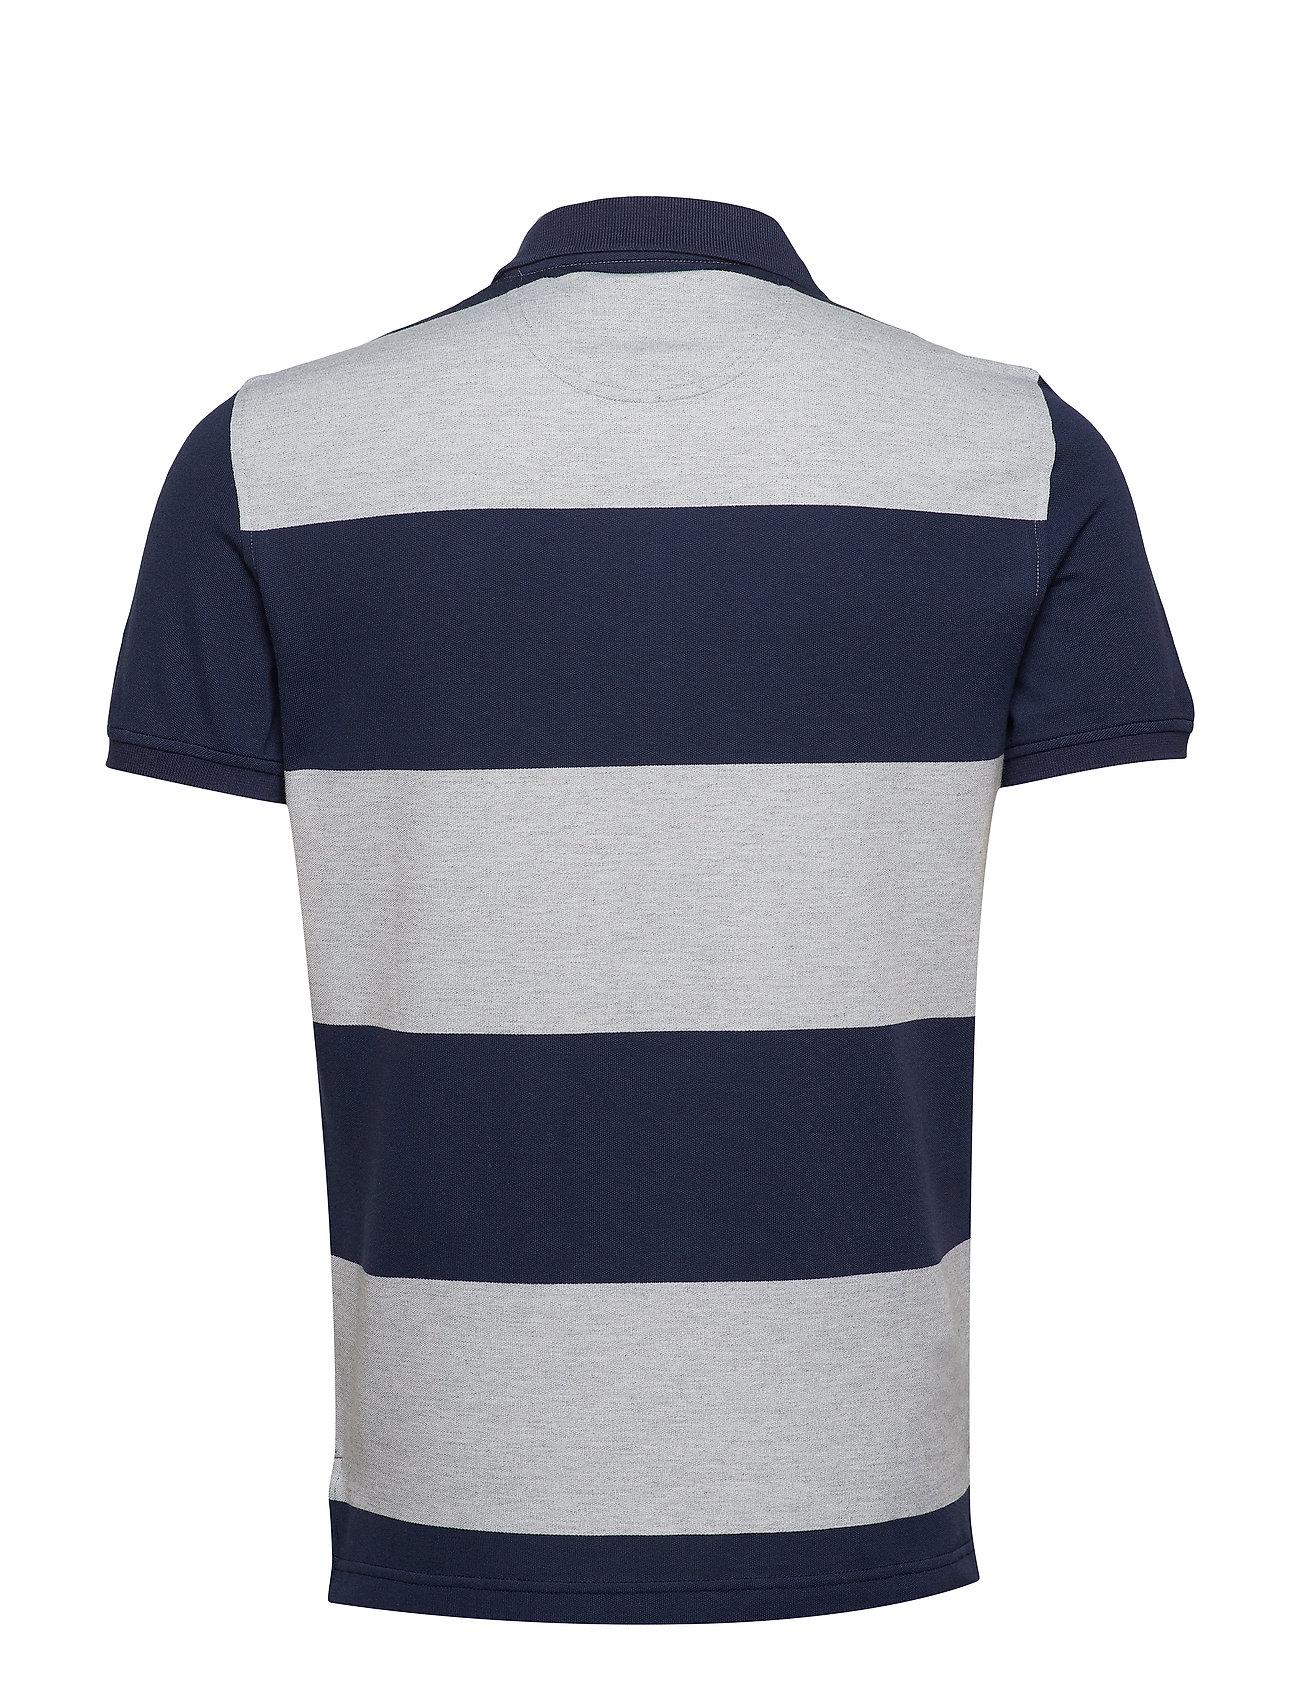 HtrIzod Performance Pololt Rugby Grey Stripe srhQCtd